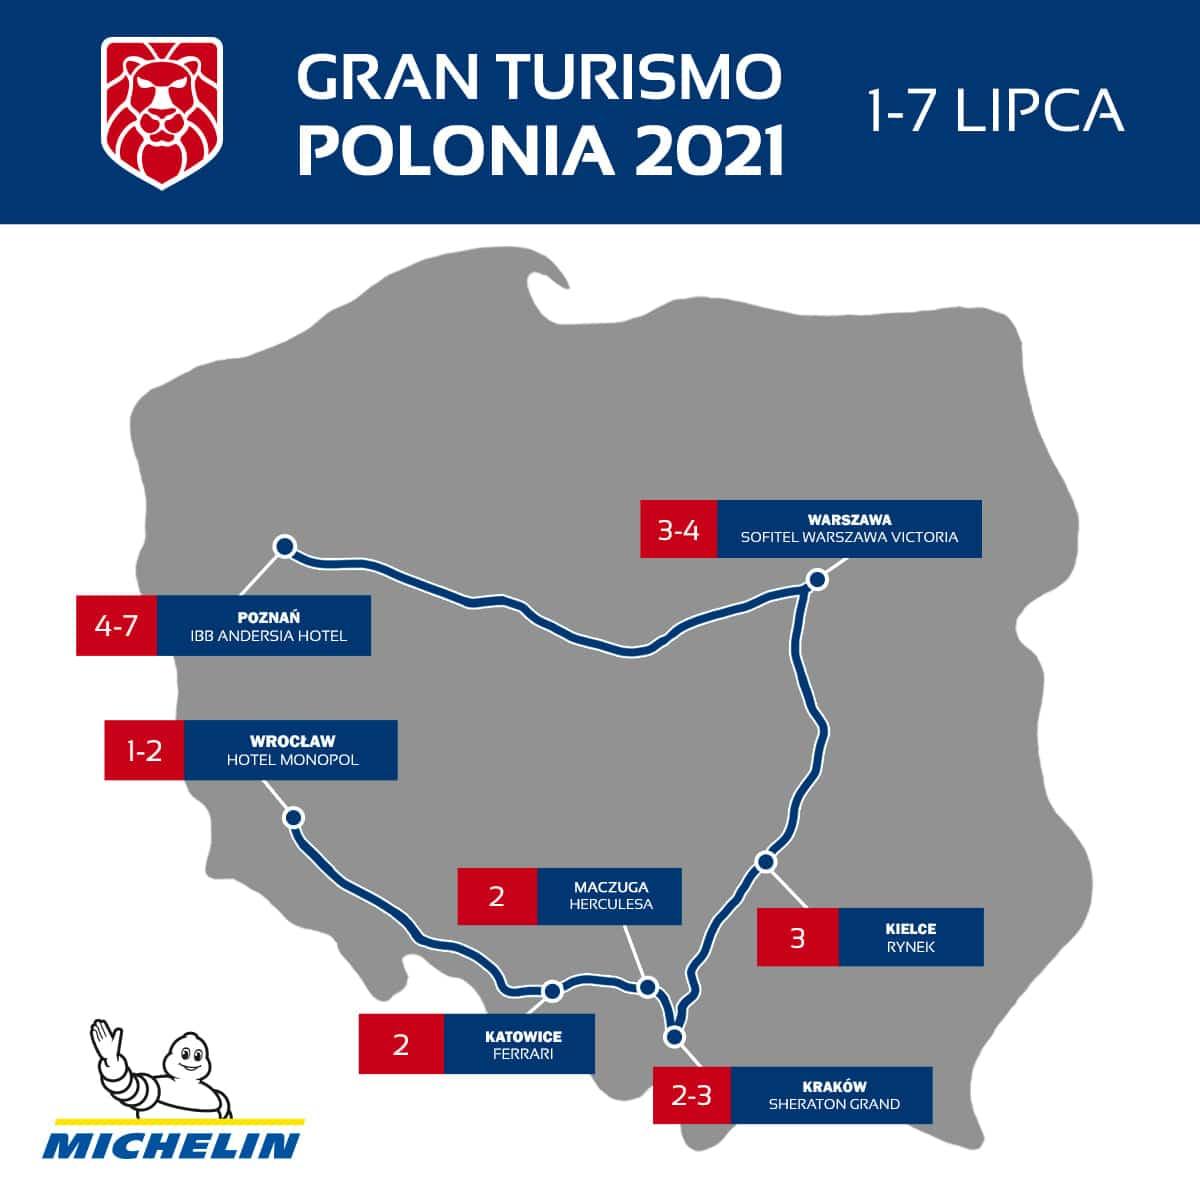 gran turismo polonia 2021